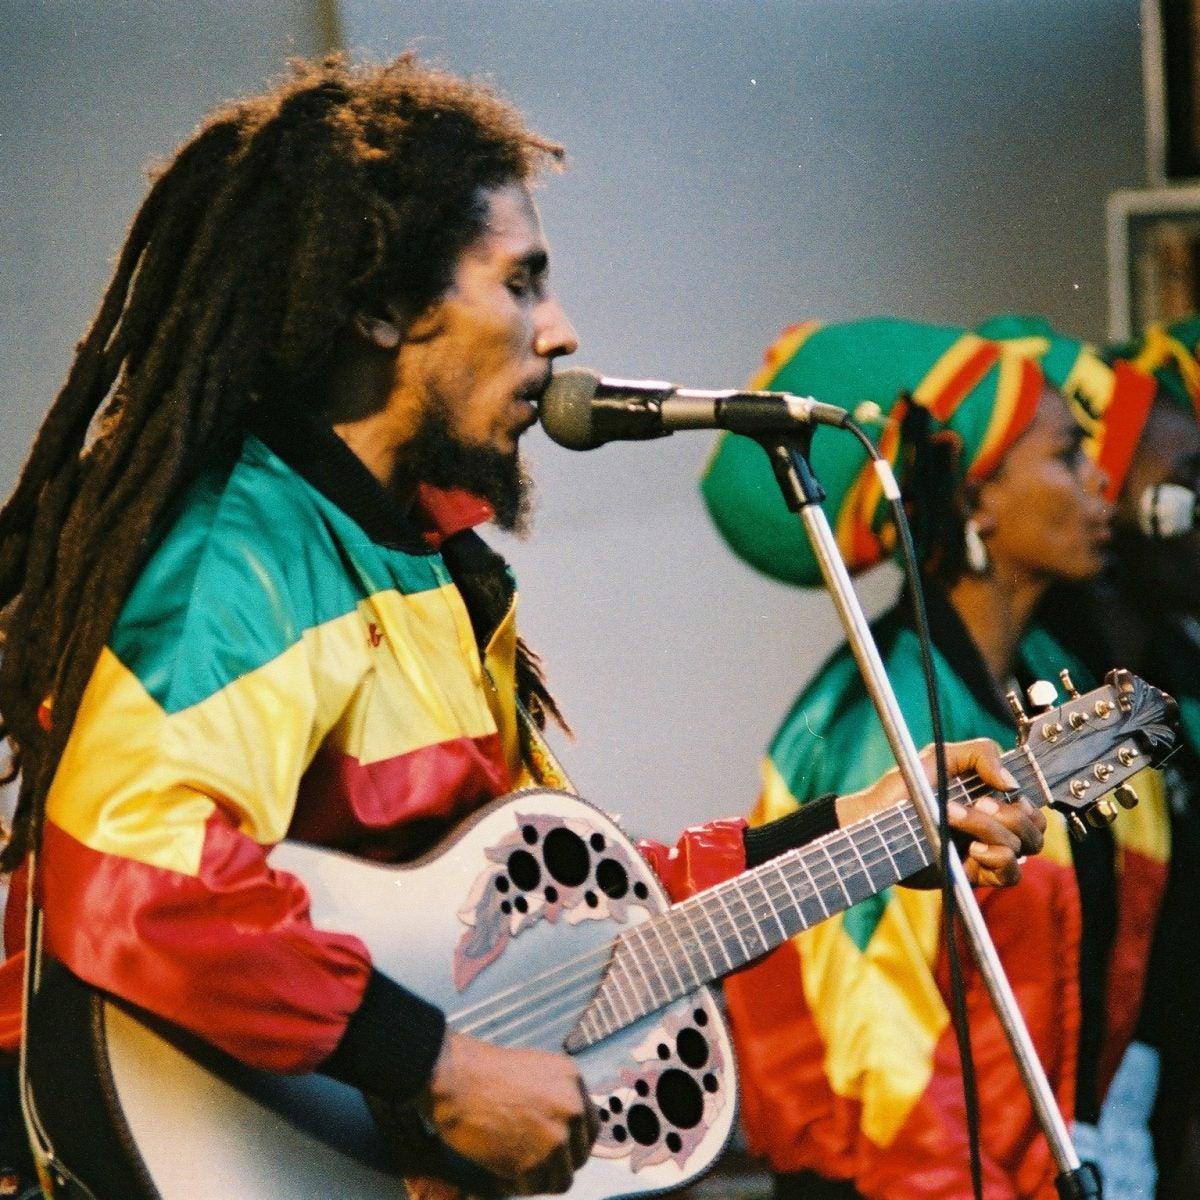 'Women Rising' Doc Looks At Female Empowerment Through Bob Marley Lyrics